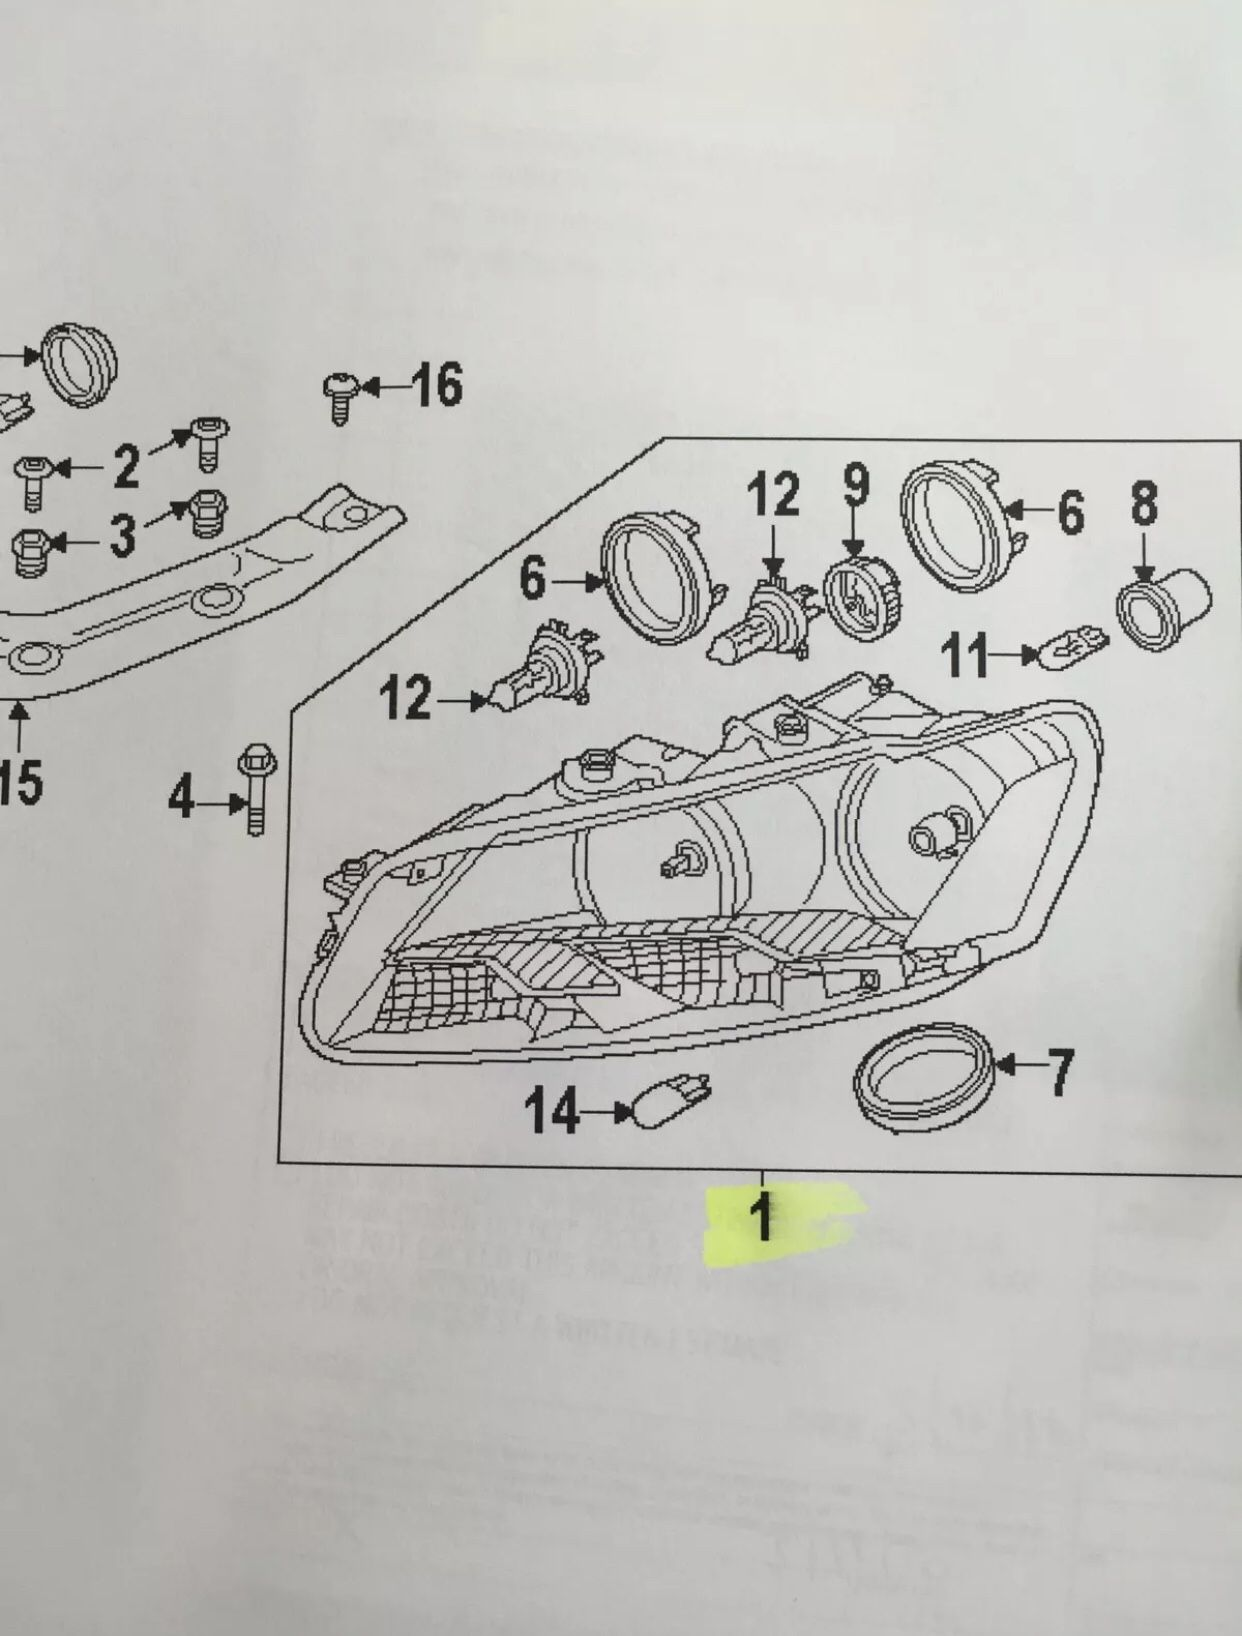 2012-2015 VW PASSAT LEFT HEADLAMP ASSY W/XENON PART # 561-941-005 D